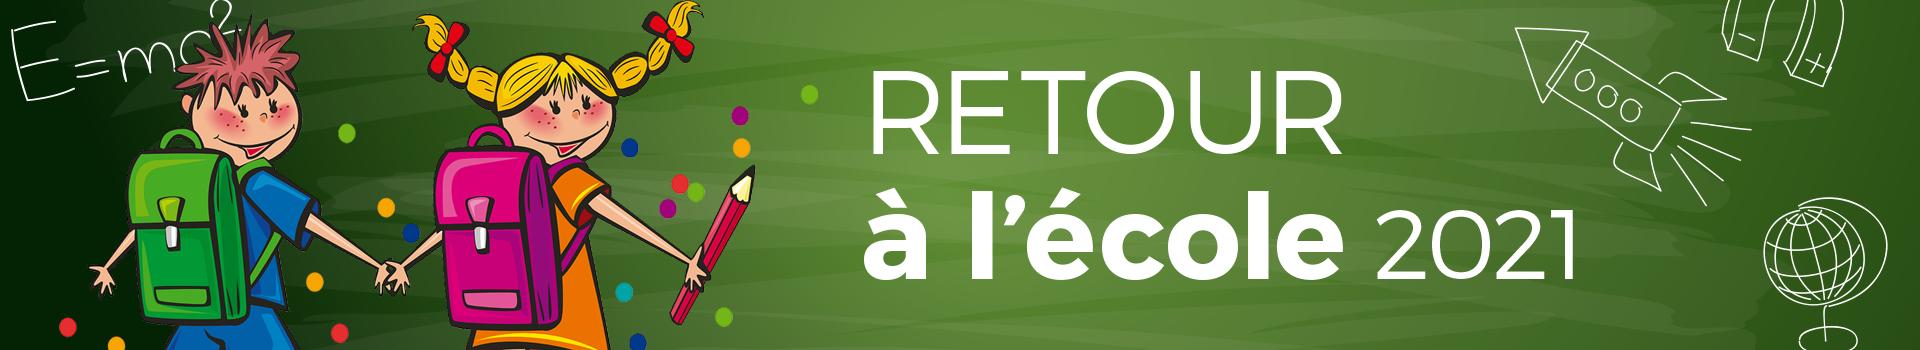 RetourAlecole_AuFilDesSaisons_1920X350